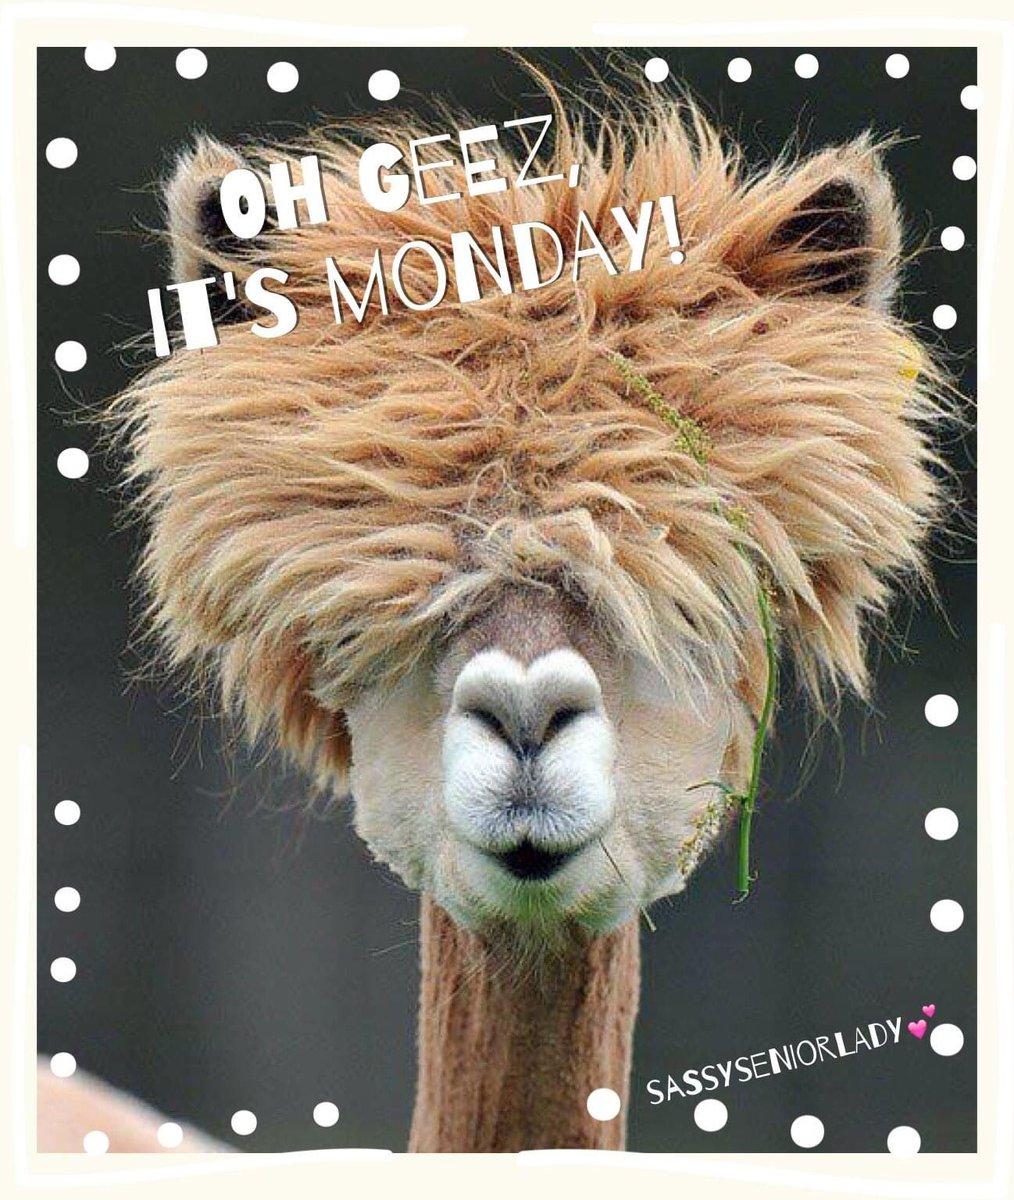 #goodmorning #MondayMorning #mondaymadness